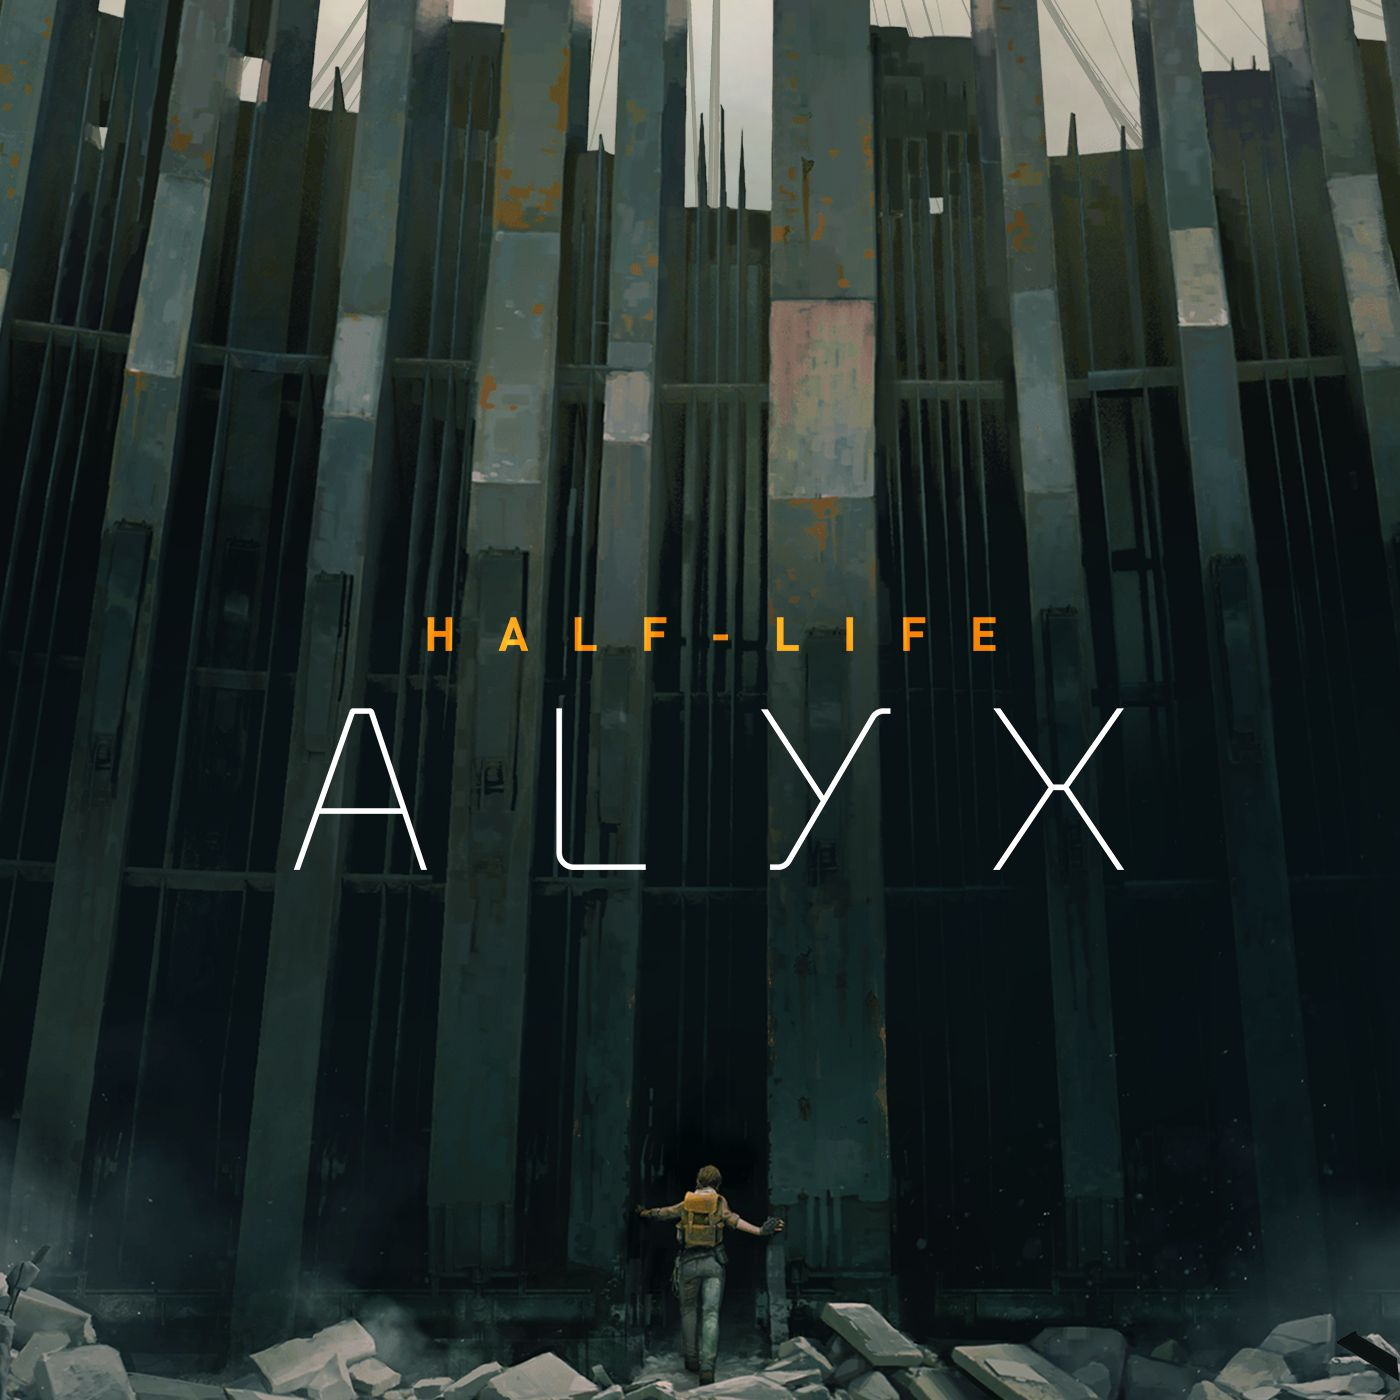 Sortie D Half Life Alyx Cette Semaine Virtual Room L A